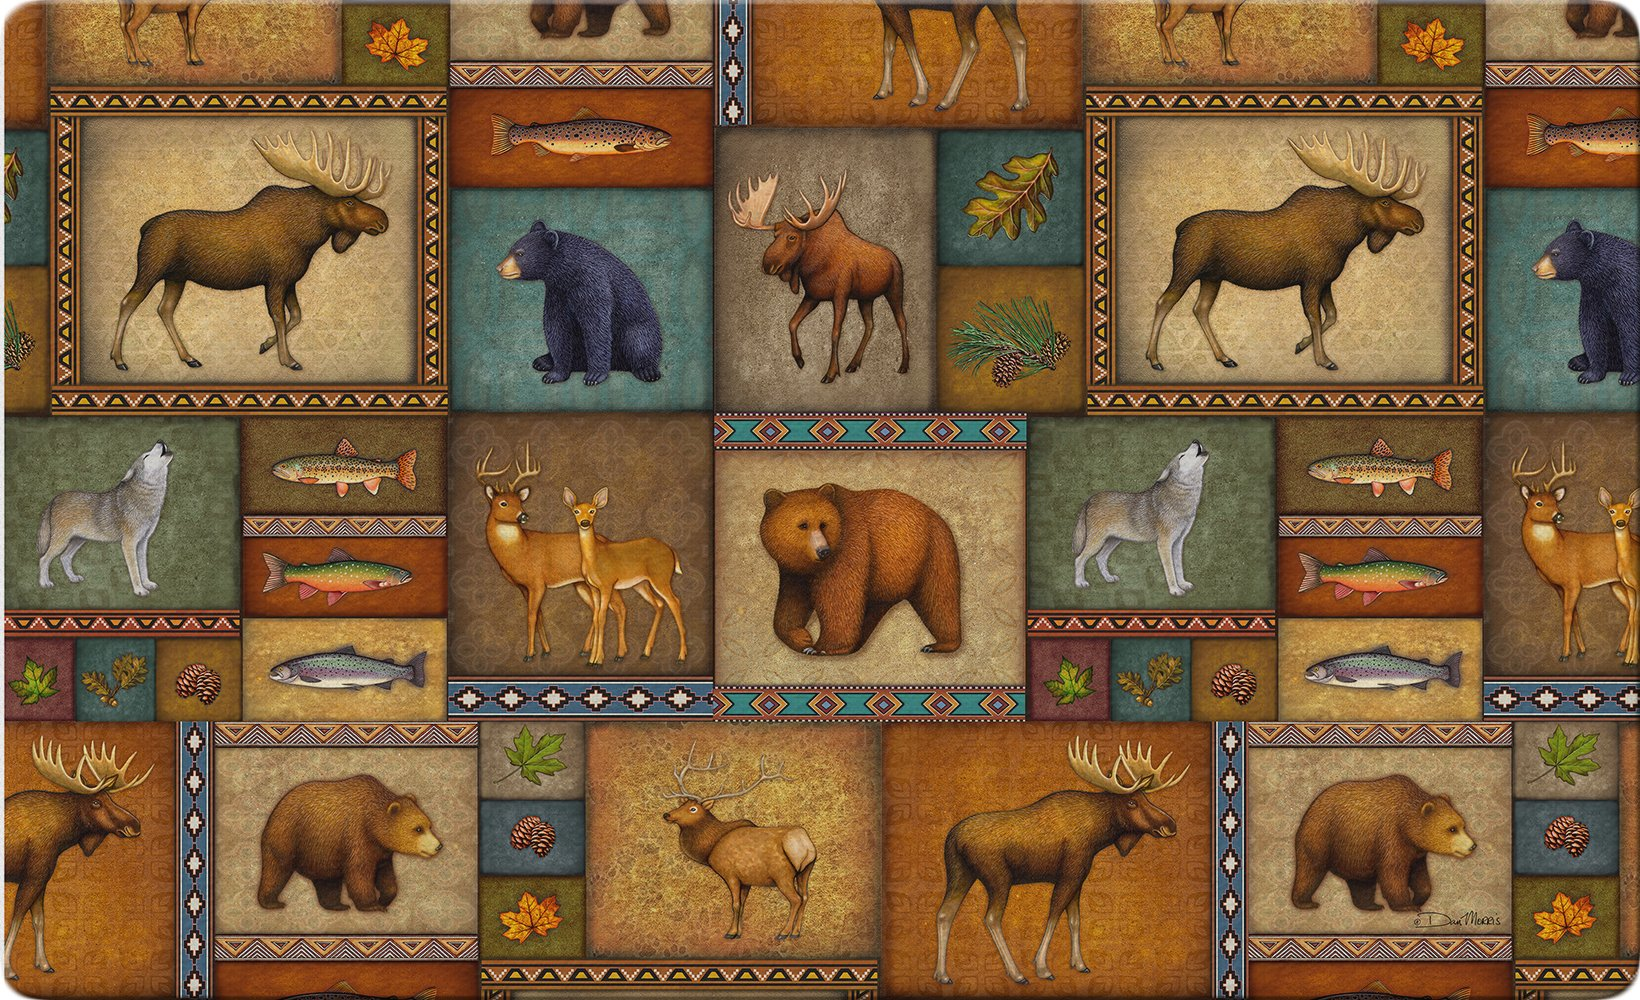 Toland Home Garden Quilted Wilderness 18 x 30 Inch Decorative Wildlife Floor Mat Animal Collage Doormat